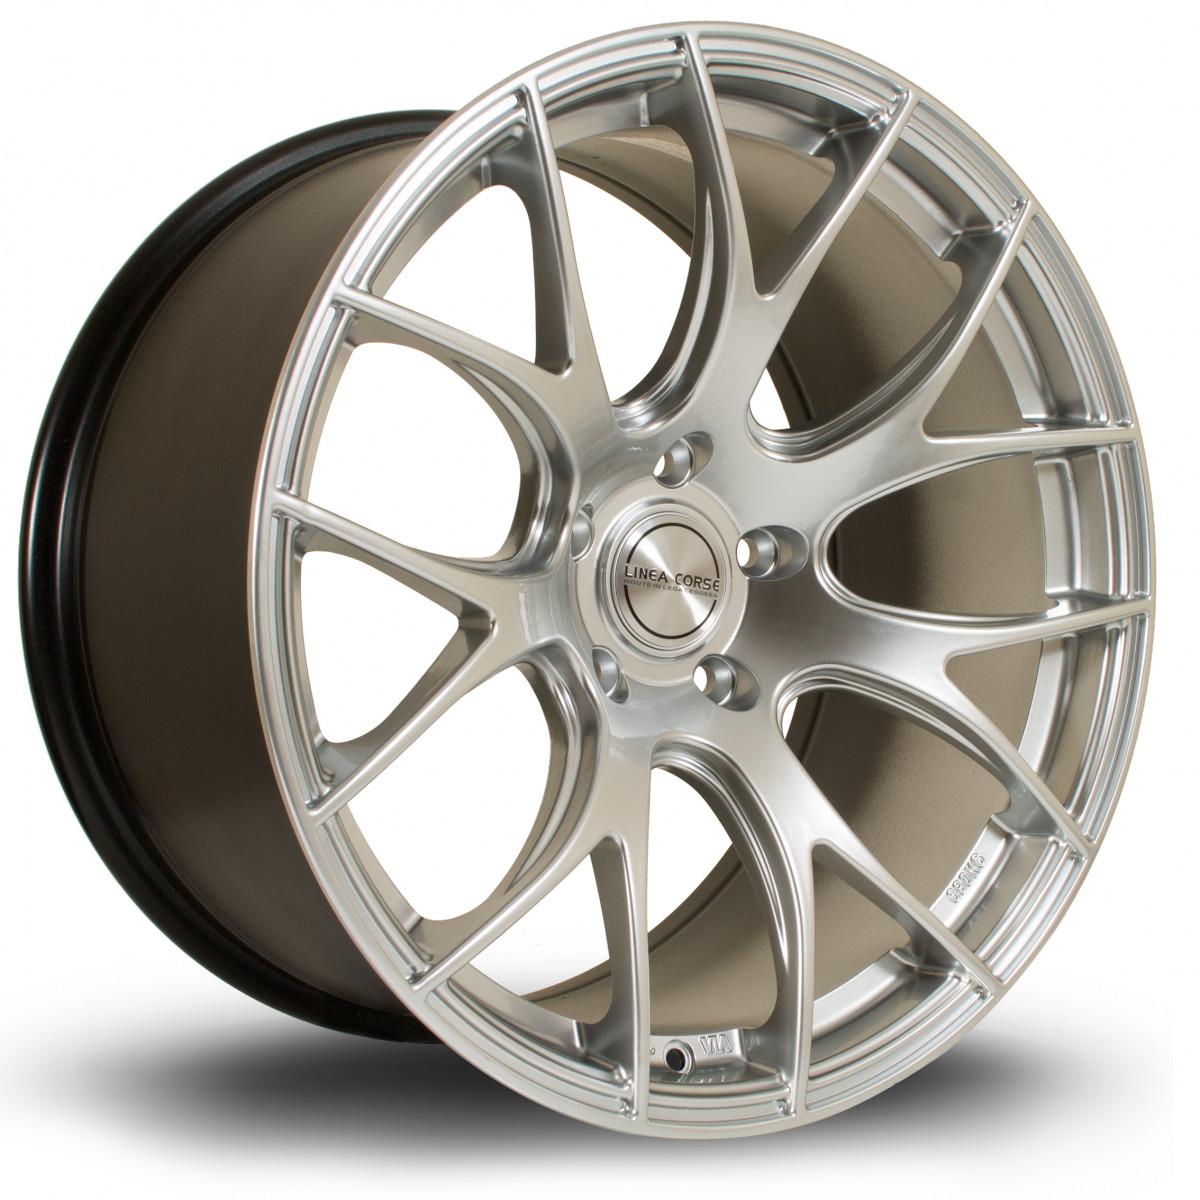 LC818 19x10 5x120 ET37 Hyper Silver